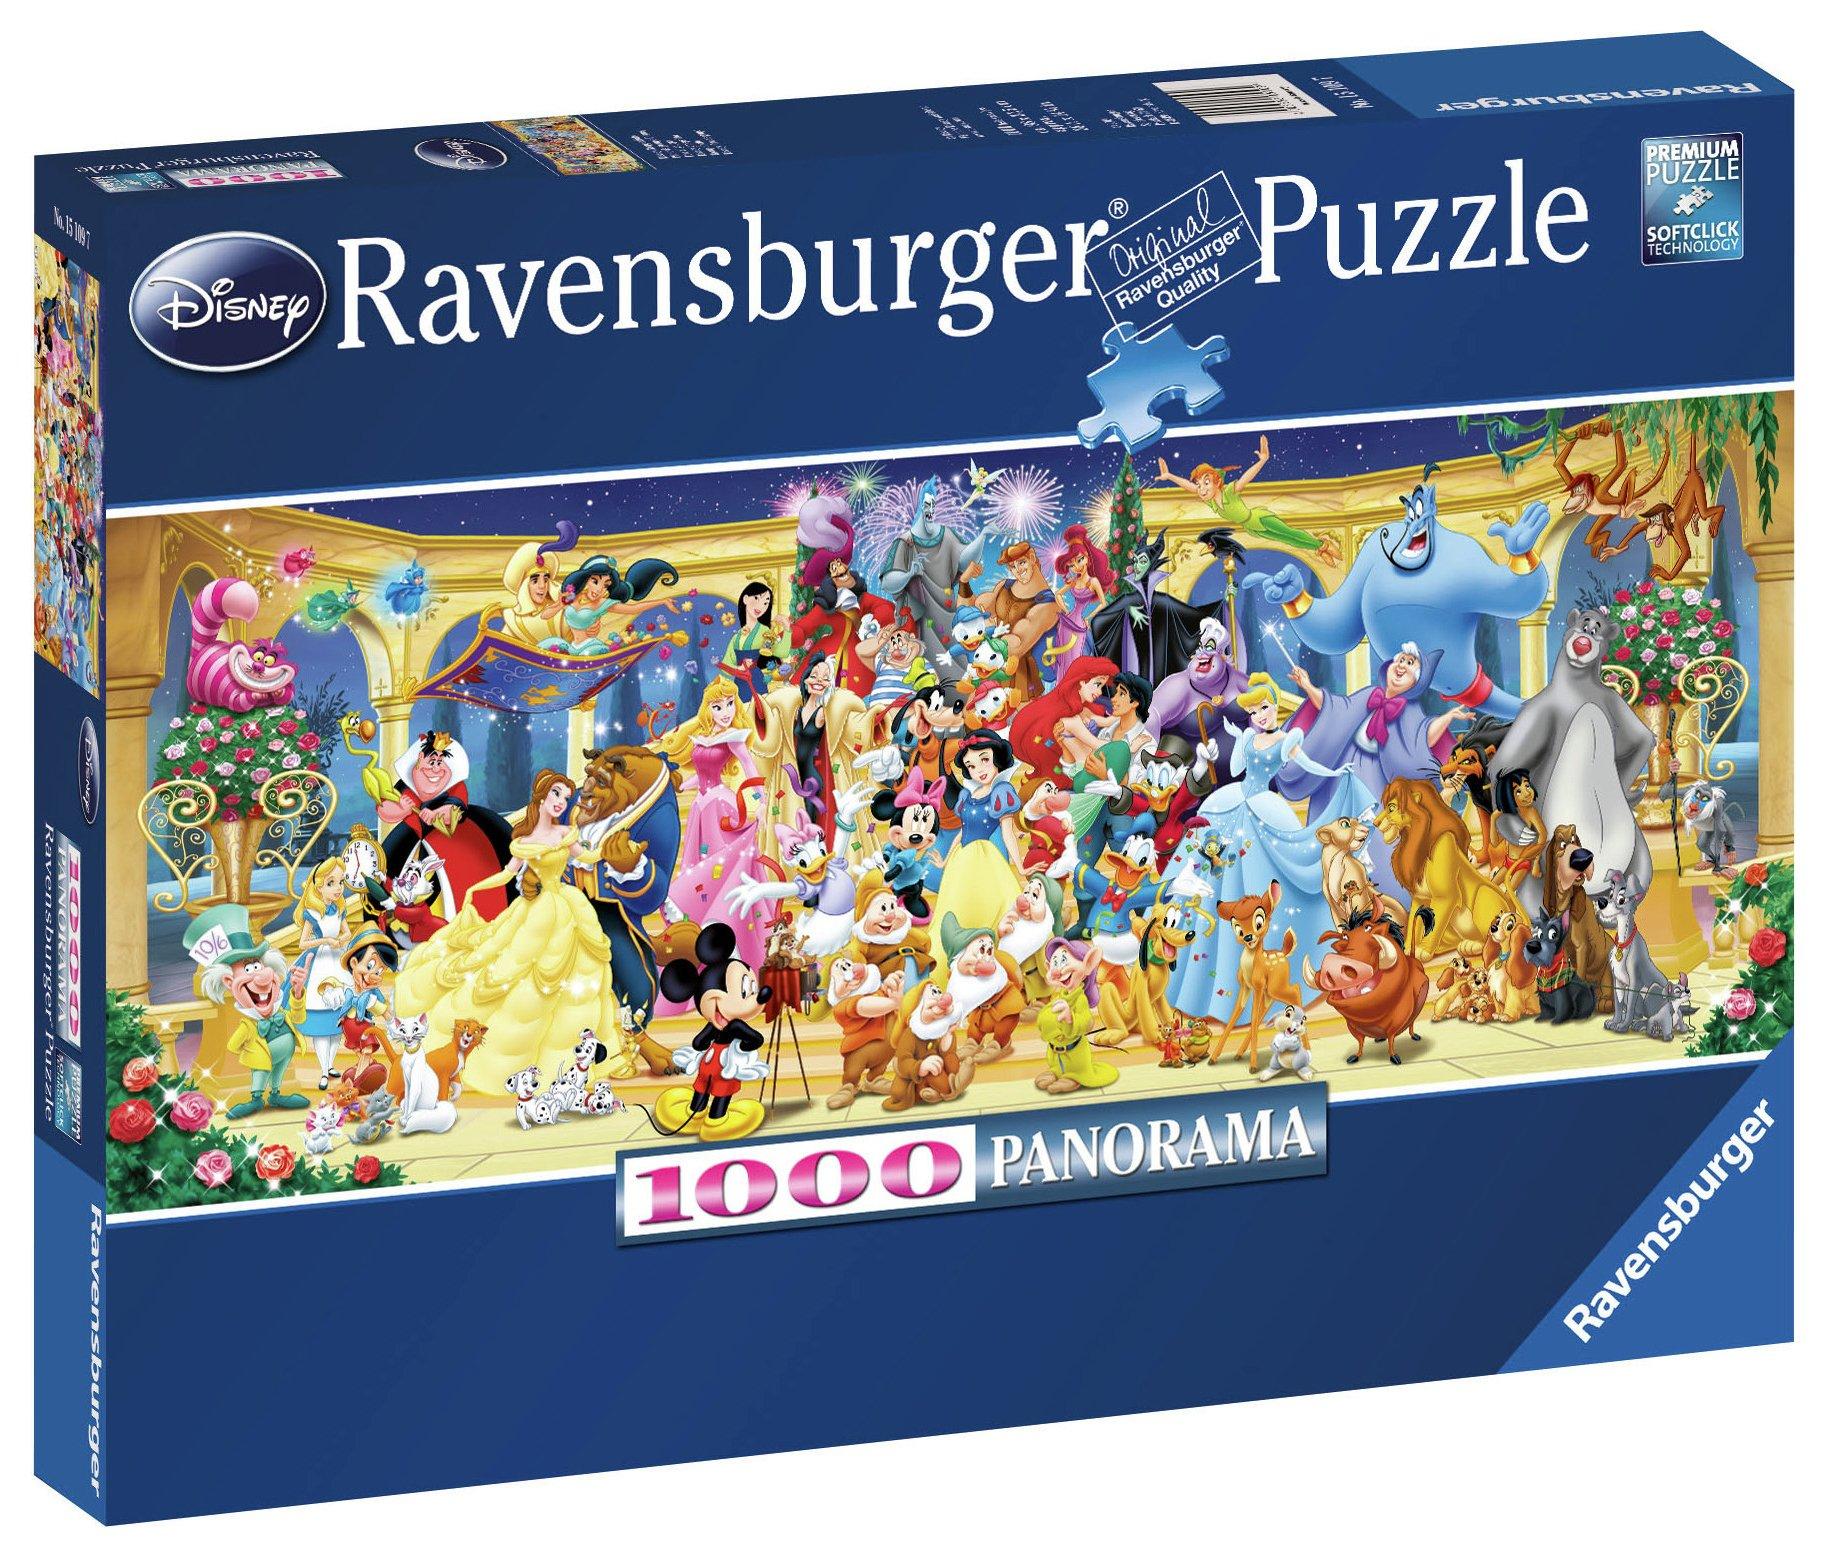 Disney 1000 Piece Panoramic Puzzle.